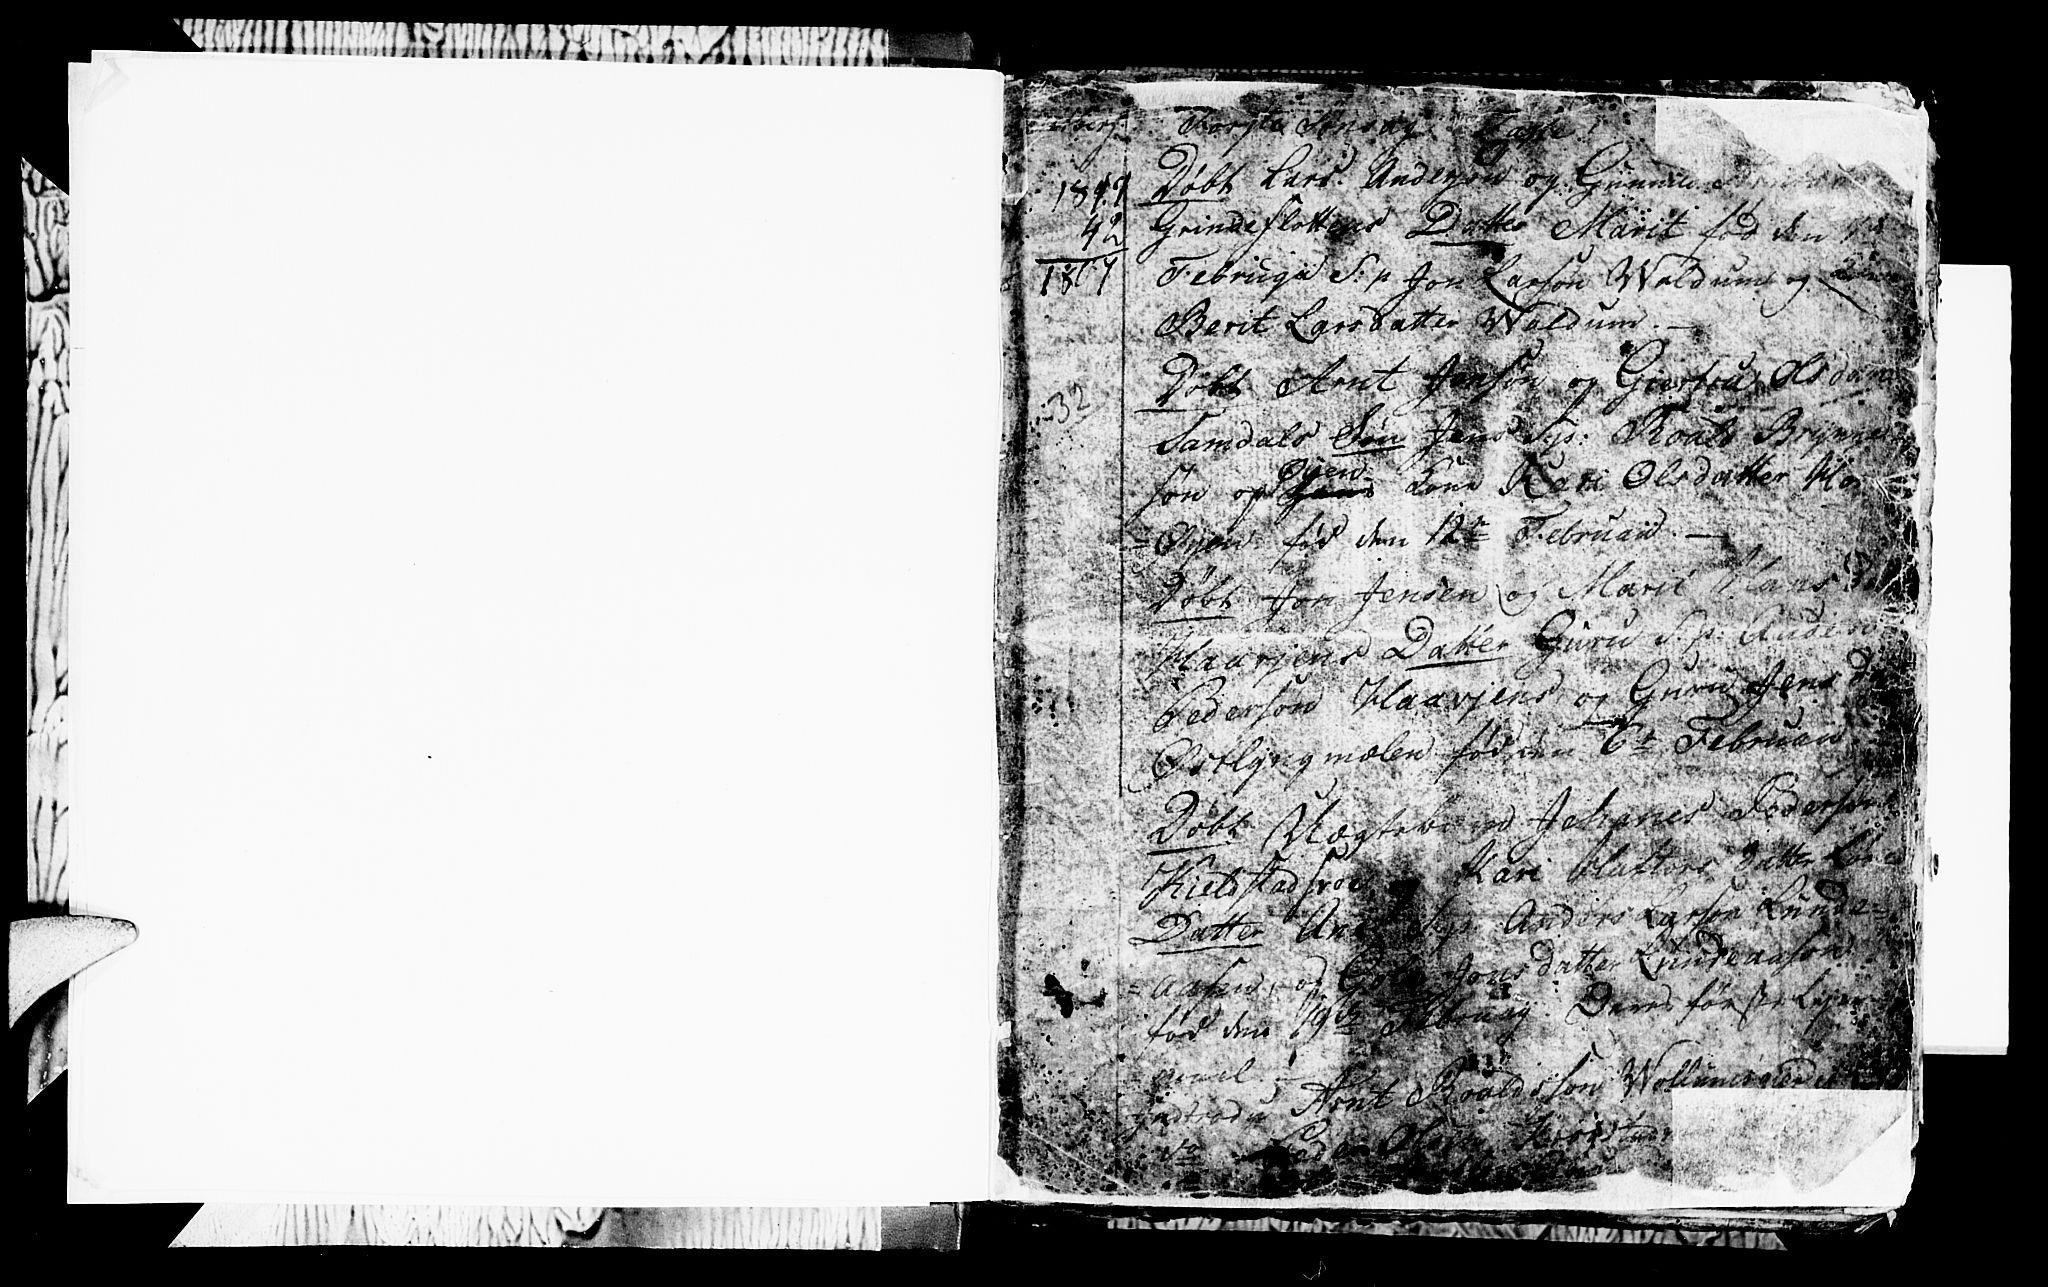 SAT, Ministerialprotokoller, klokkerbøker og fødselsregistre - Sør-Trøndelag, 692/L1107: Parish register (copy) no. 692C02, 1809-1824